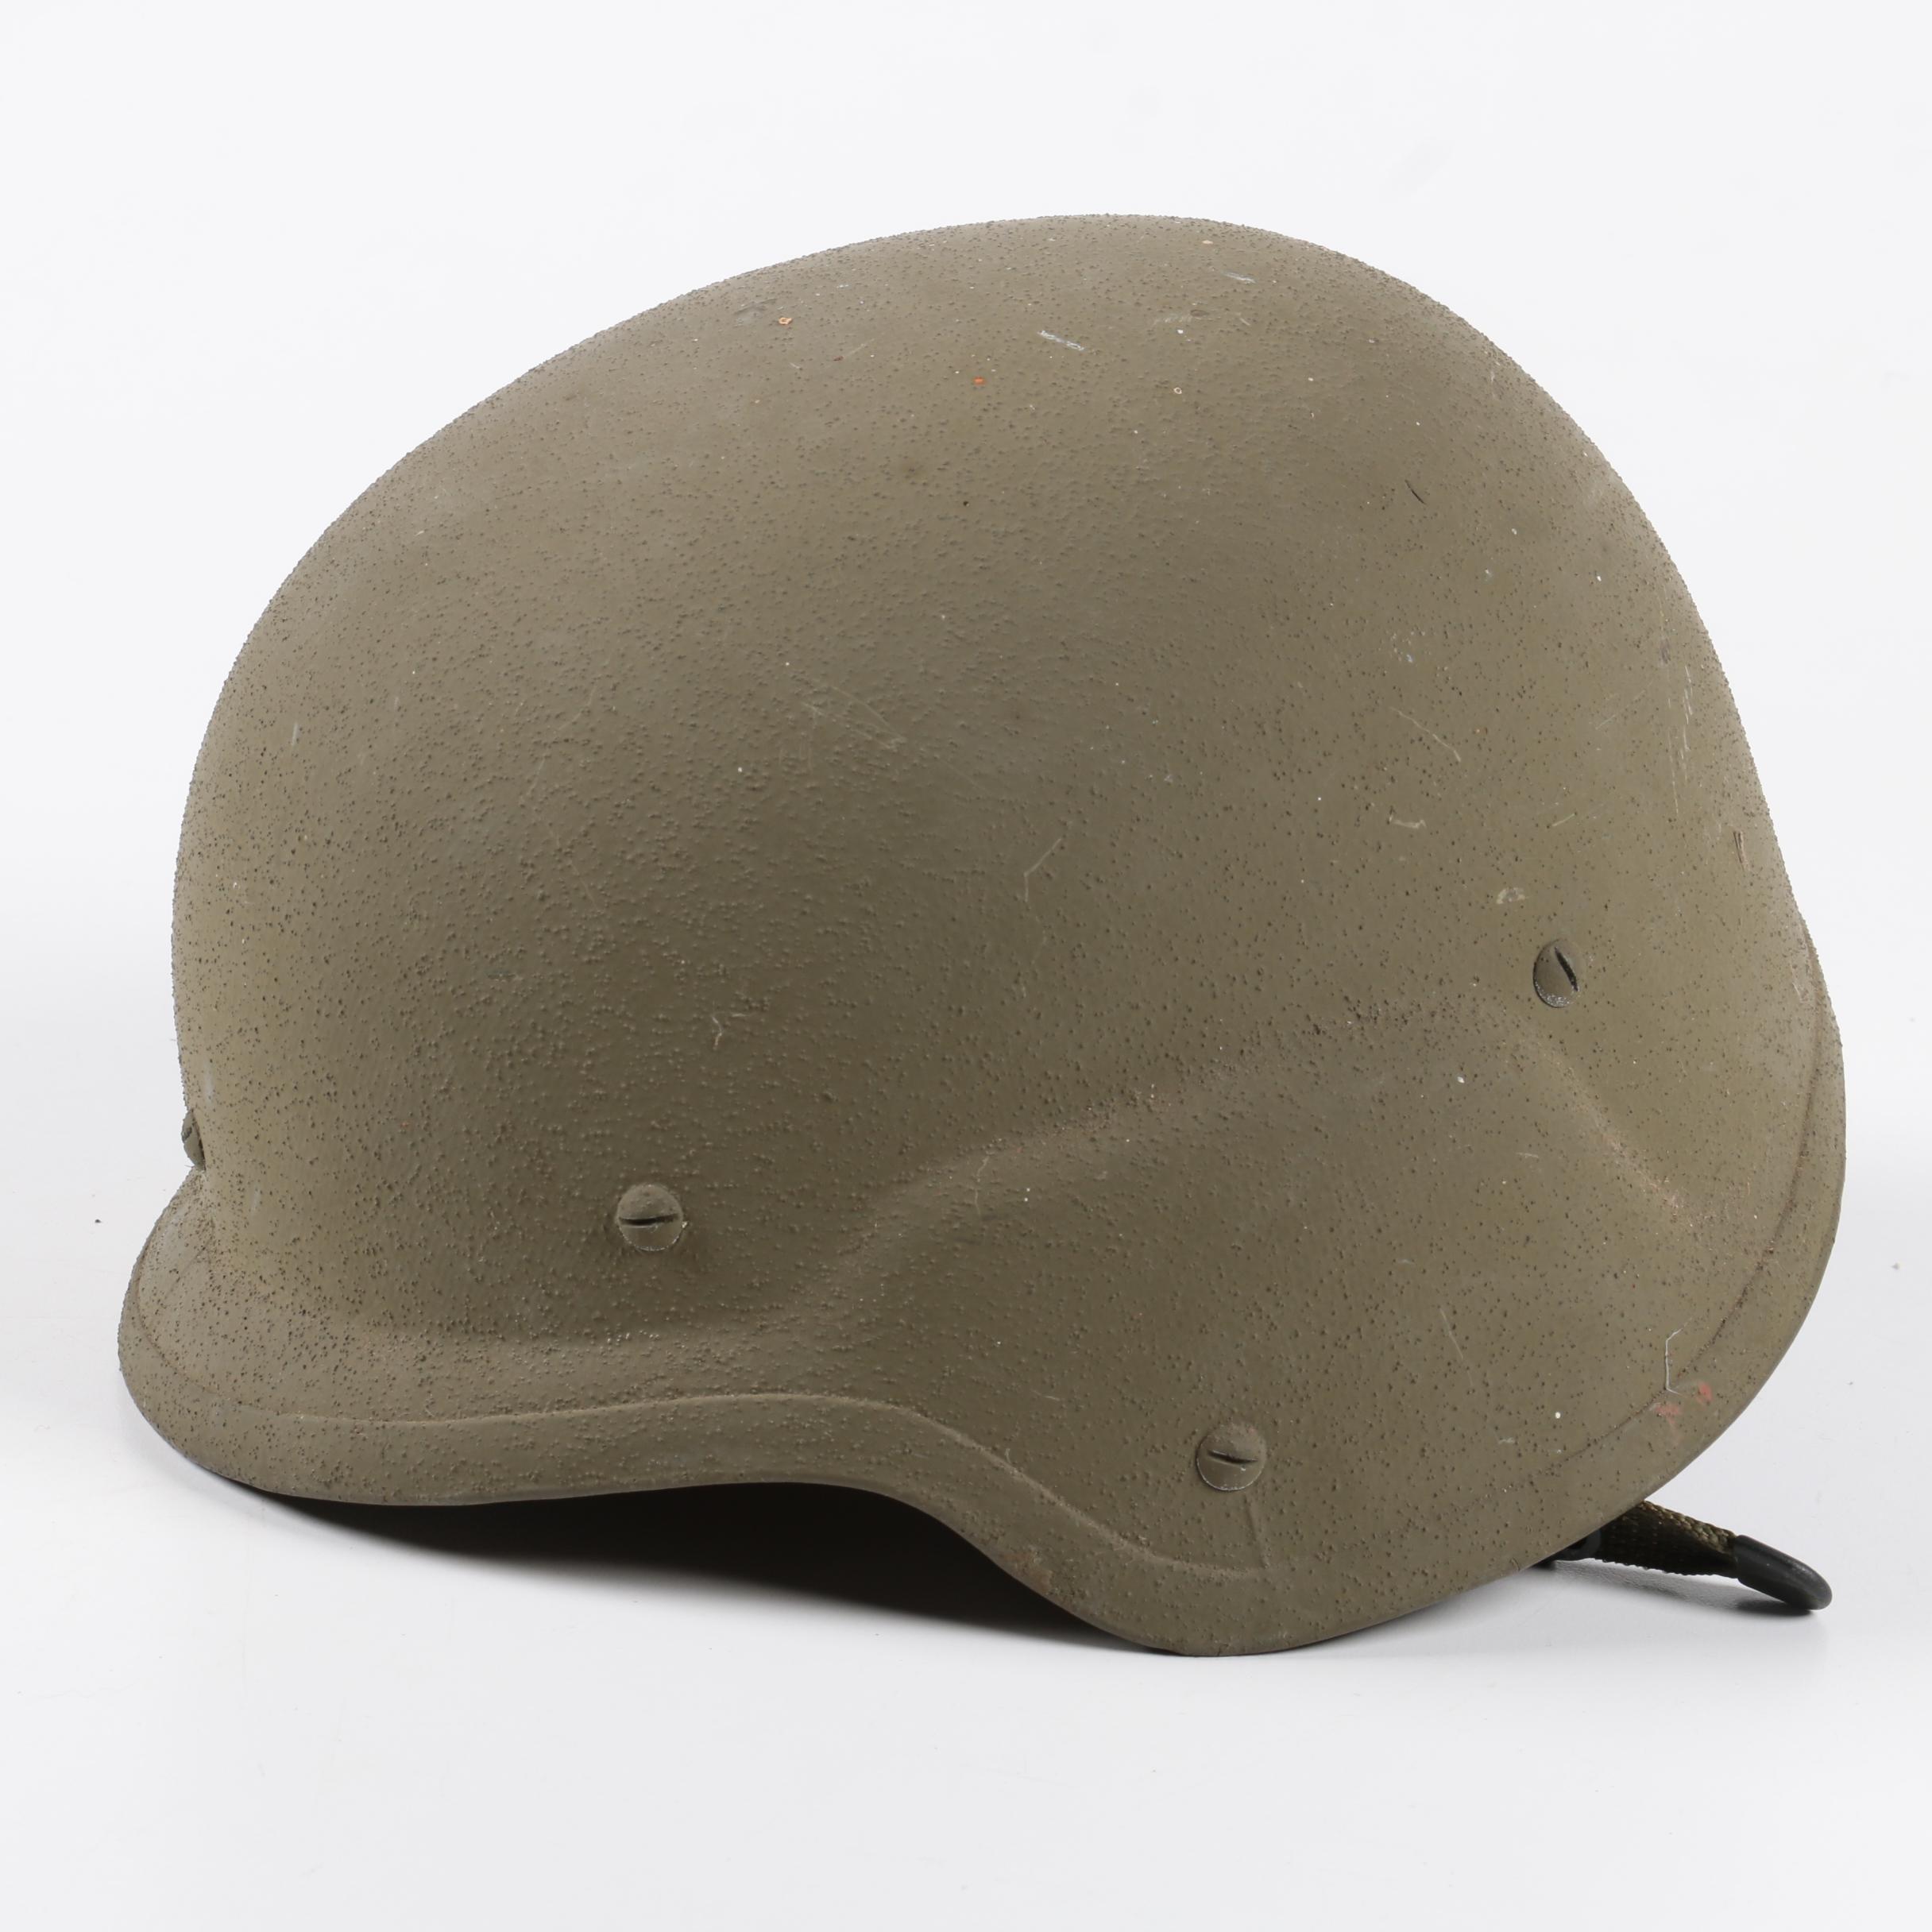 A US Military Ground Troops Helmet